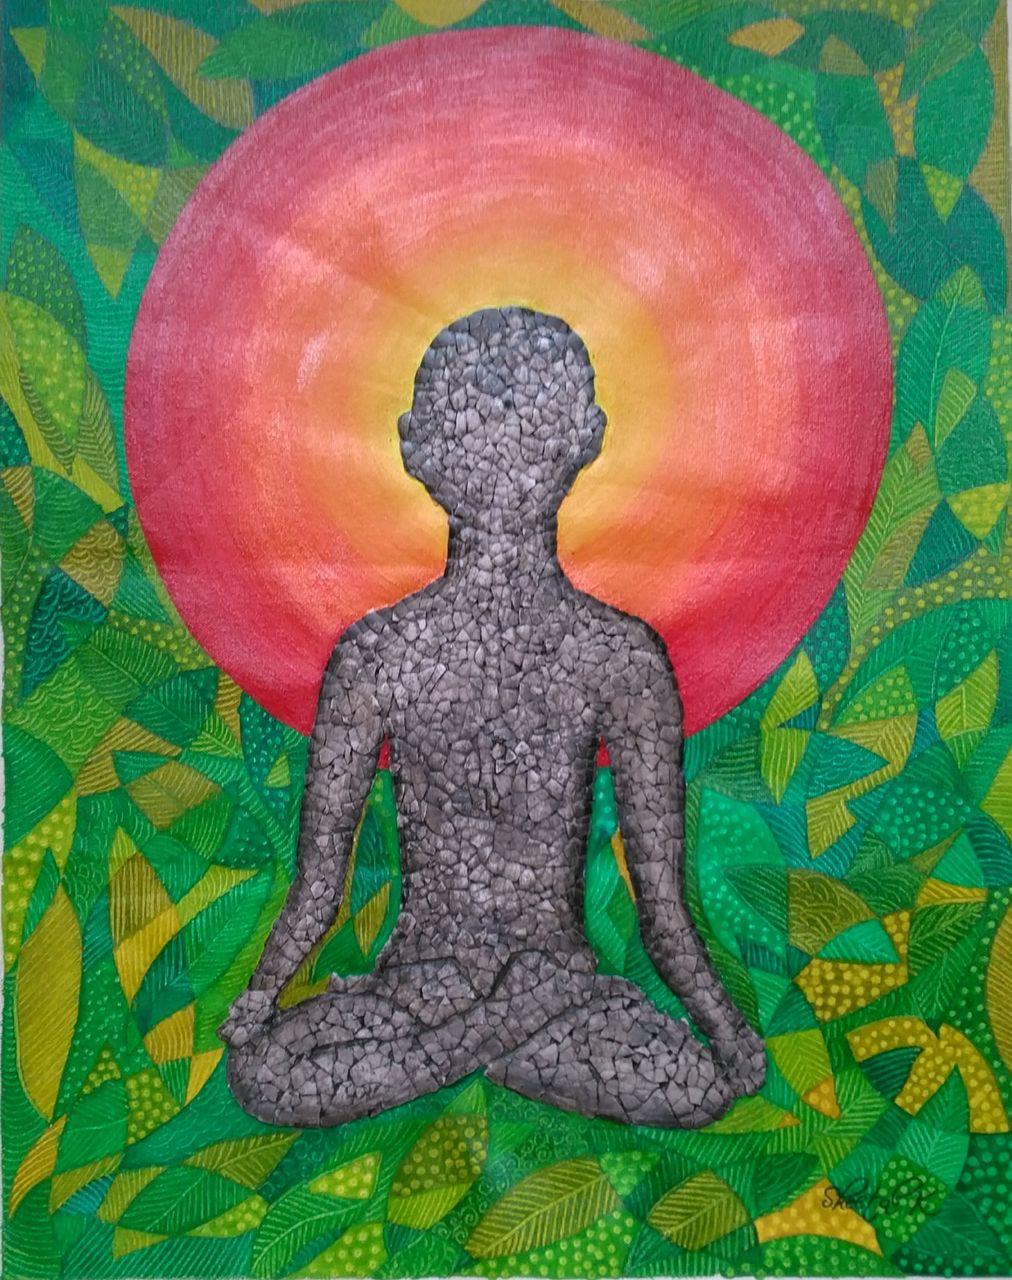 Human Drawing Person Meditating Yoga PaintingHuman DrawingART 1435 15400Artist